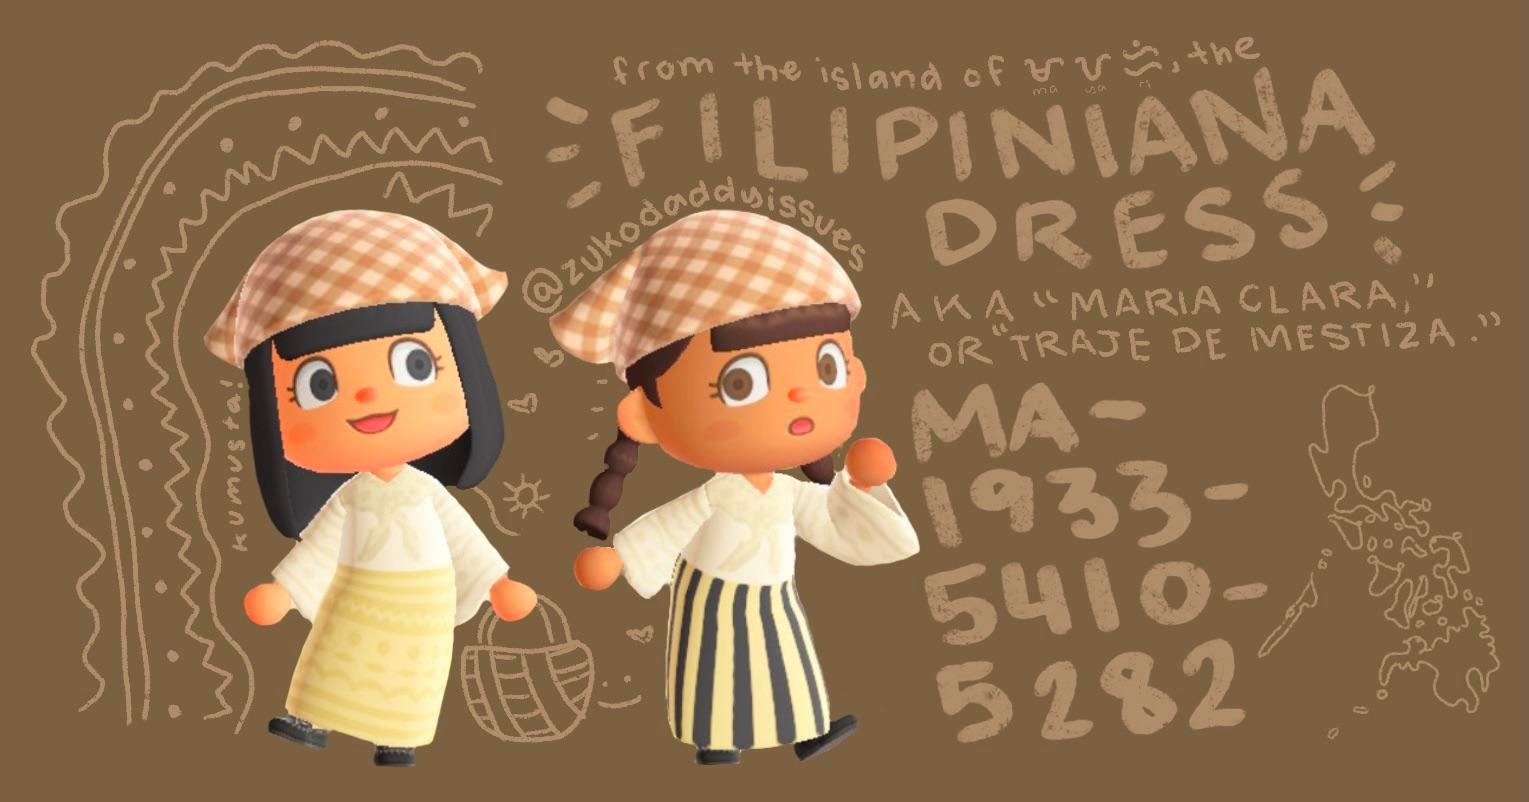 I made filipiniana dresses in animal crossing! (MA-1933-5410-5282)